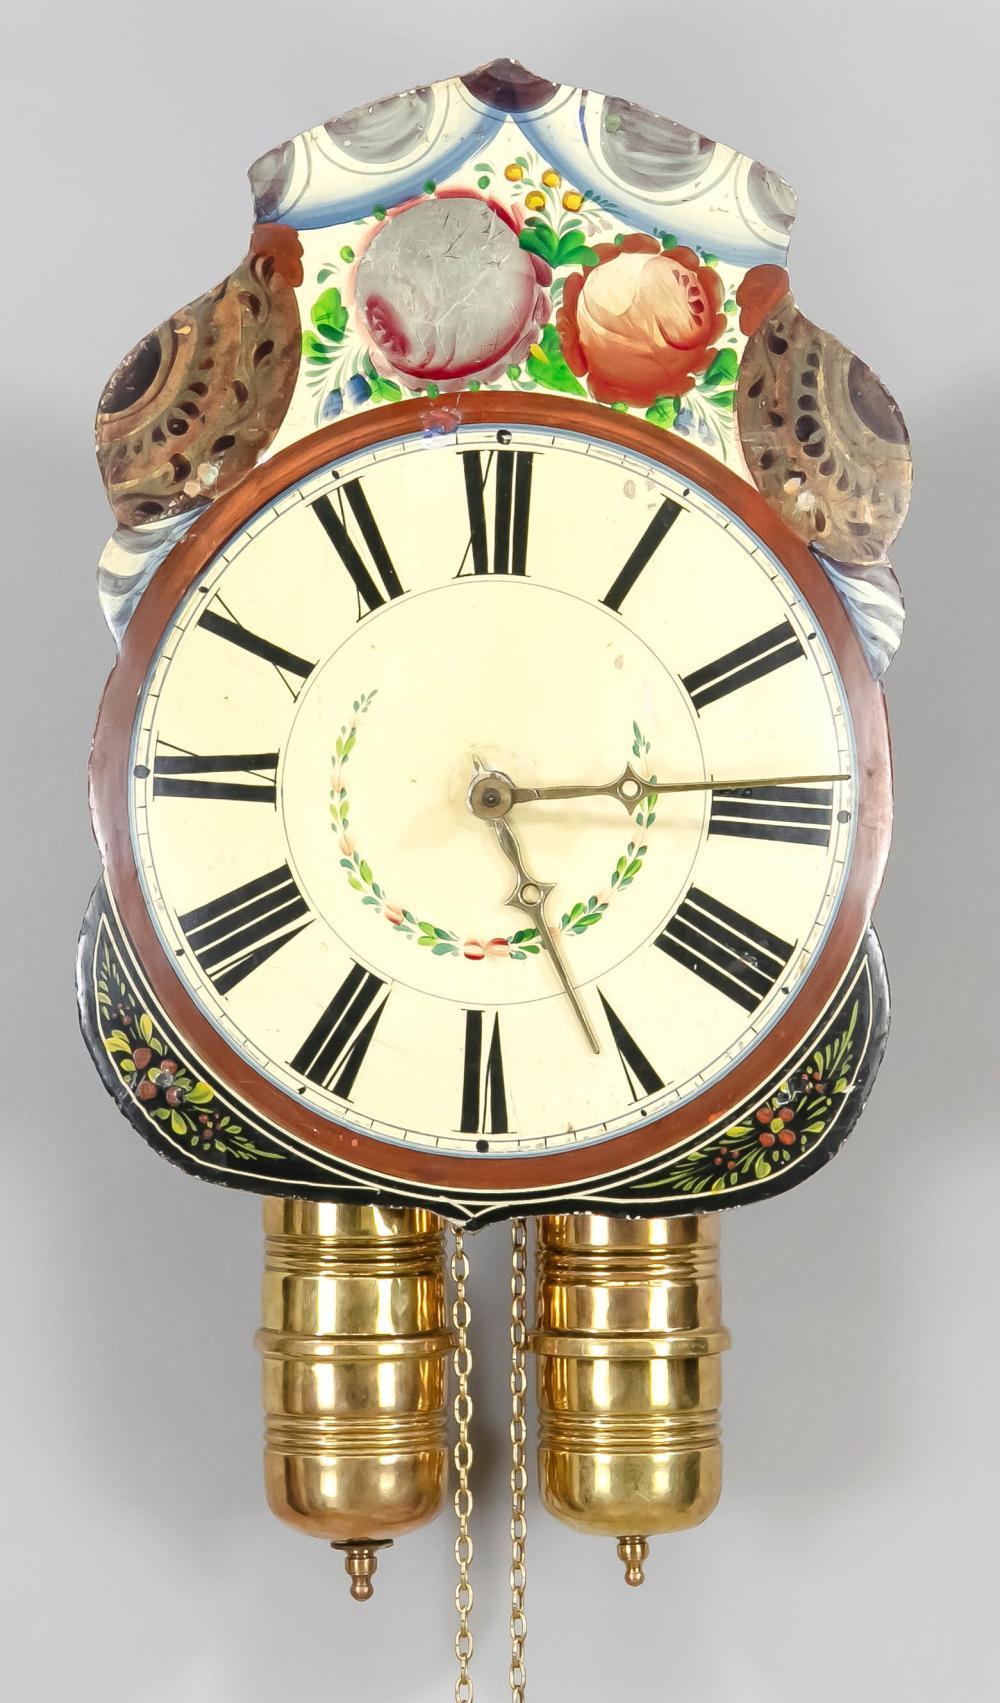 Tartan clock, beginning of the